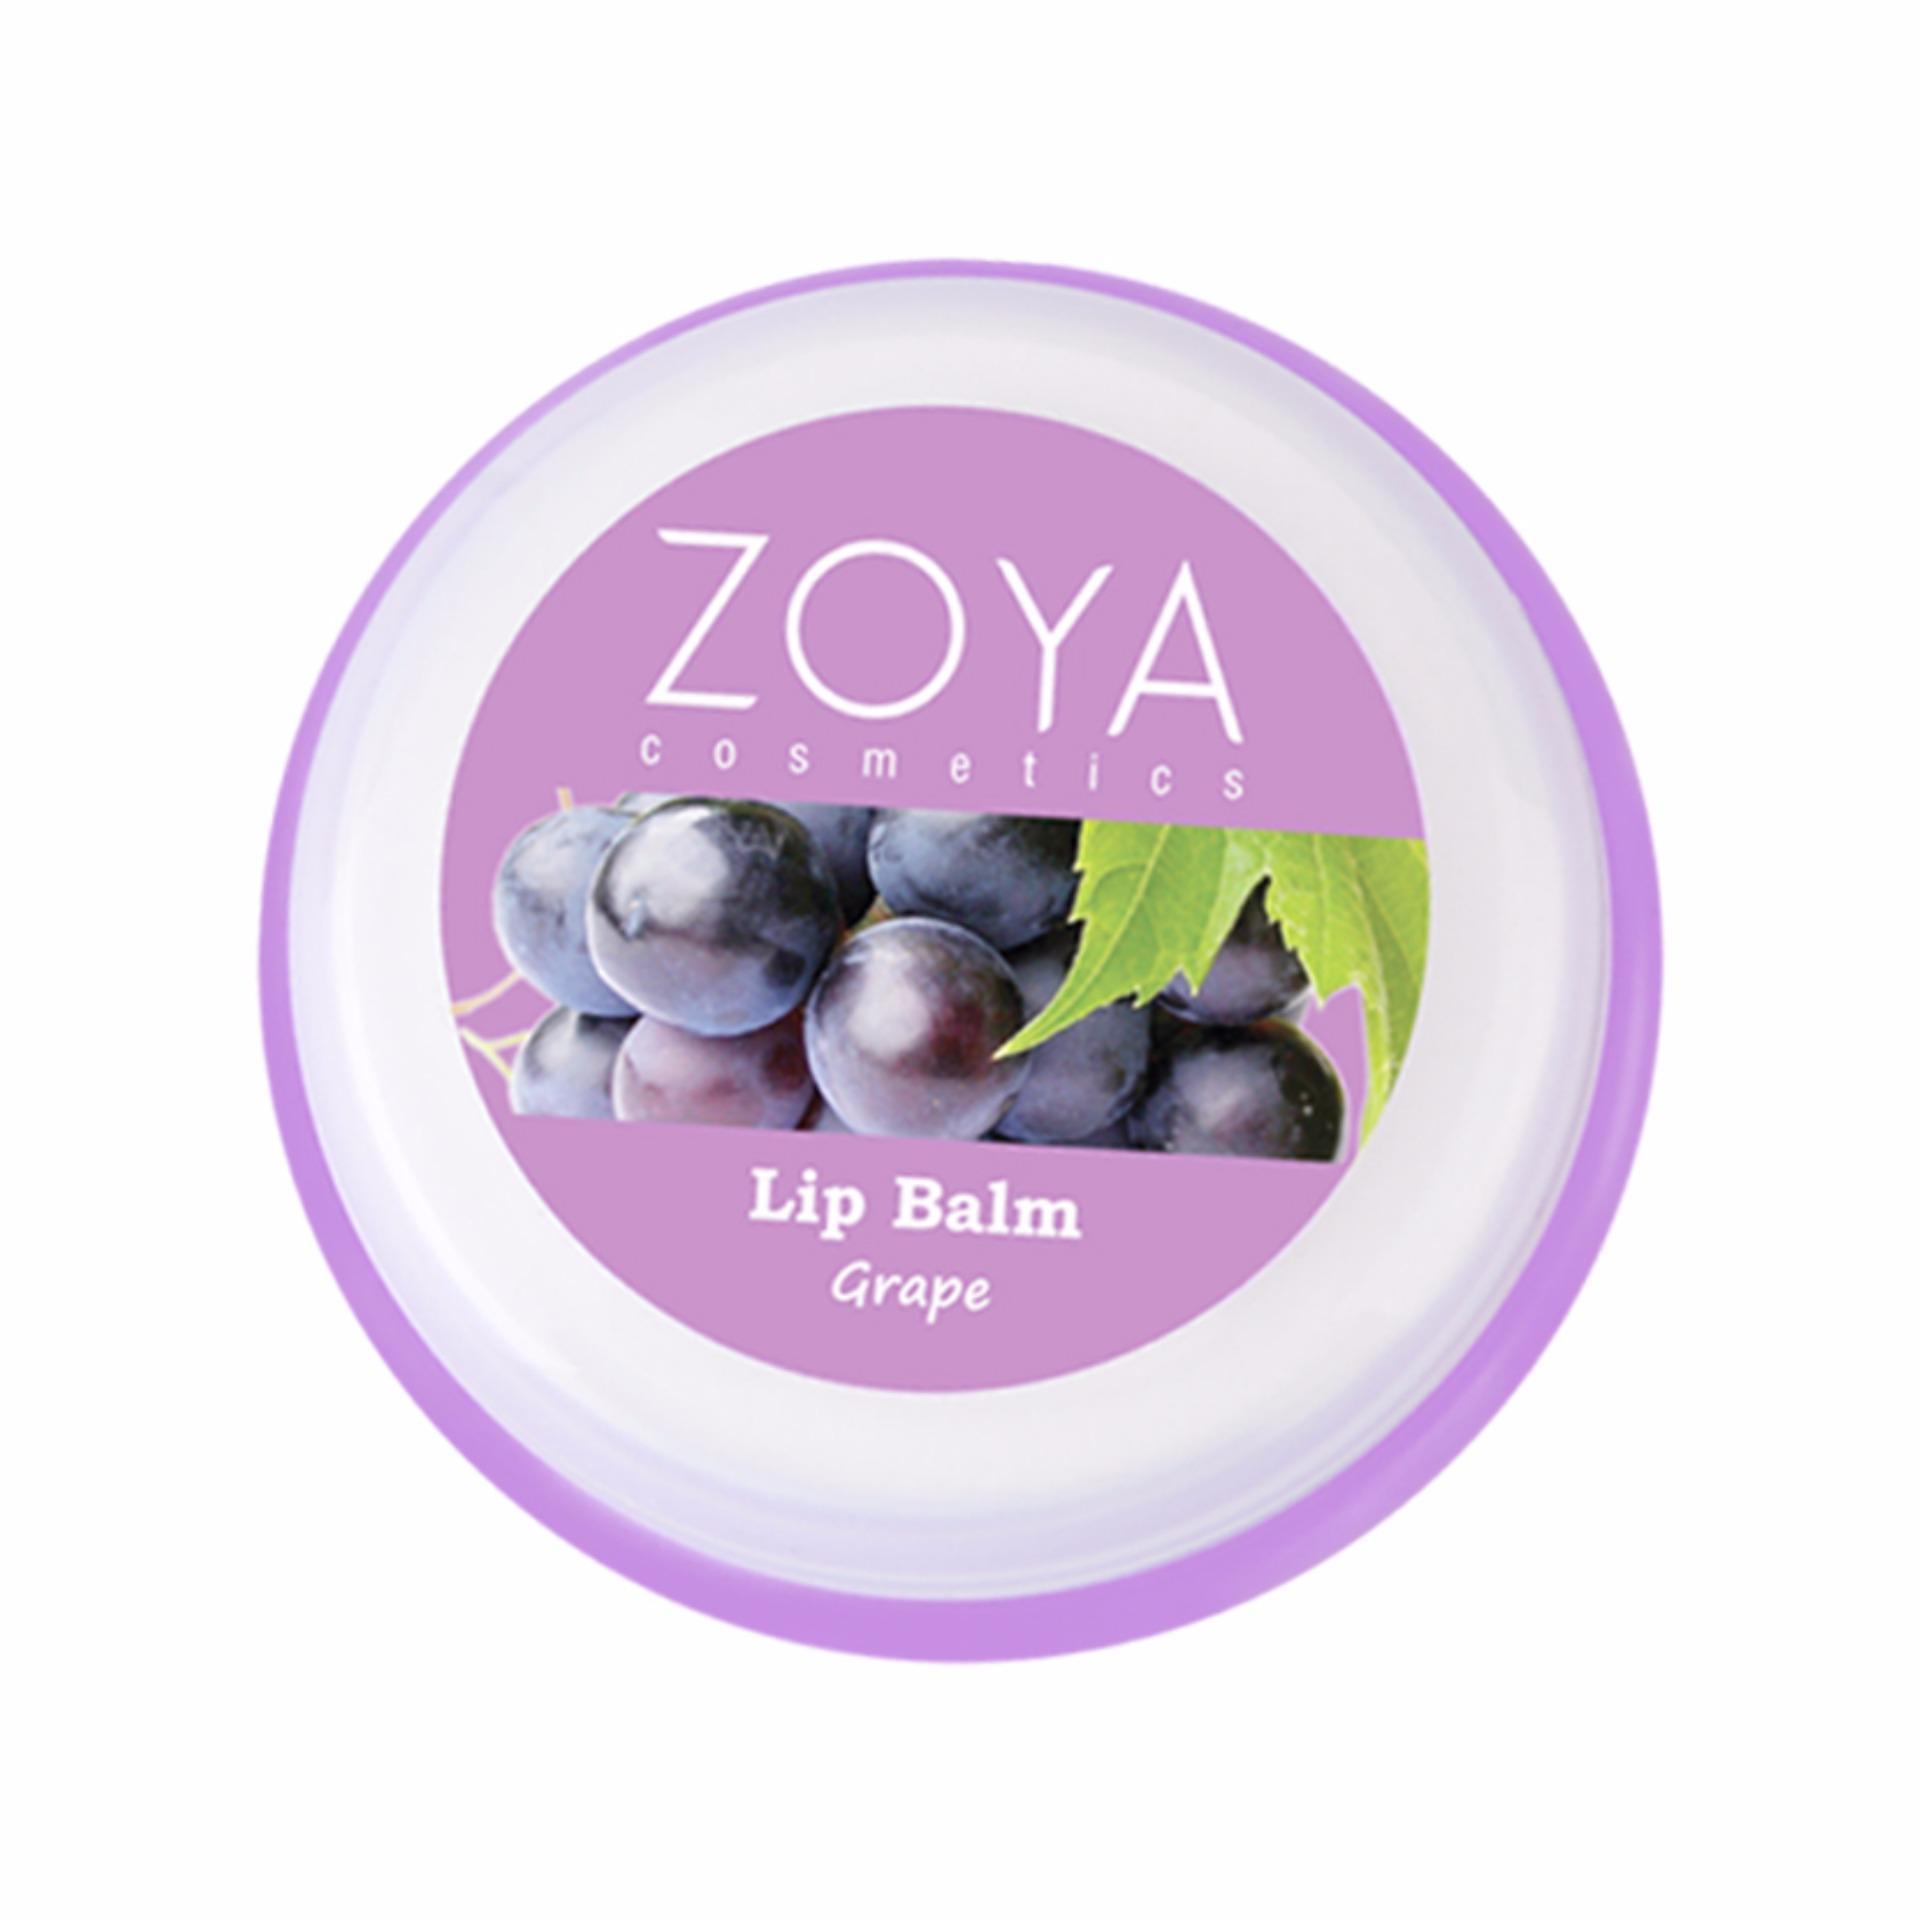 Zoya Cosmetics Ultramatte Lipstick 04 Amberglow 25gr Daftar Harga Ultramoisse Lip Strawbeery Ice 2 5gr Source Balm Grape